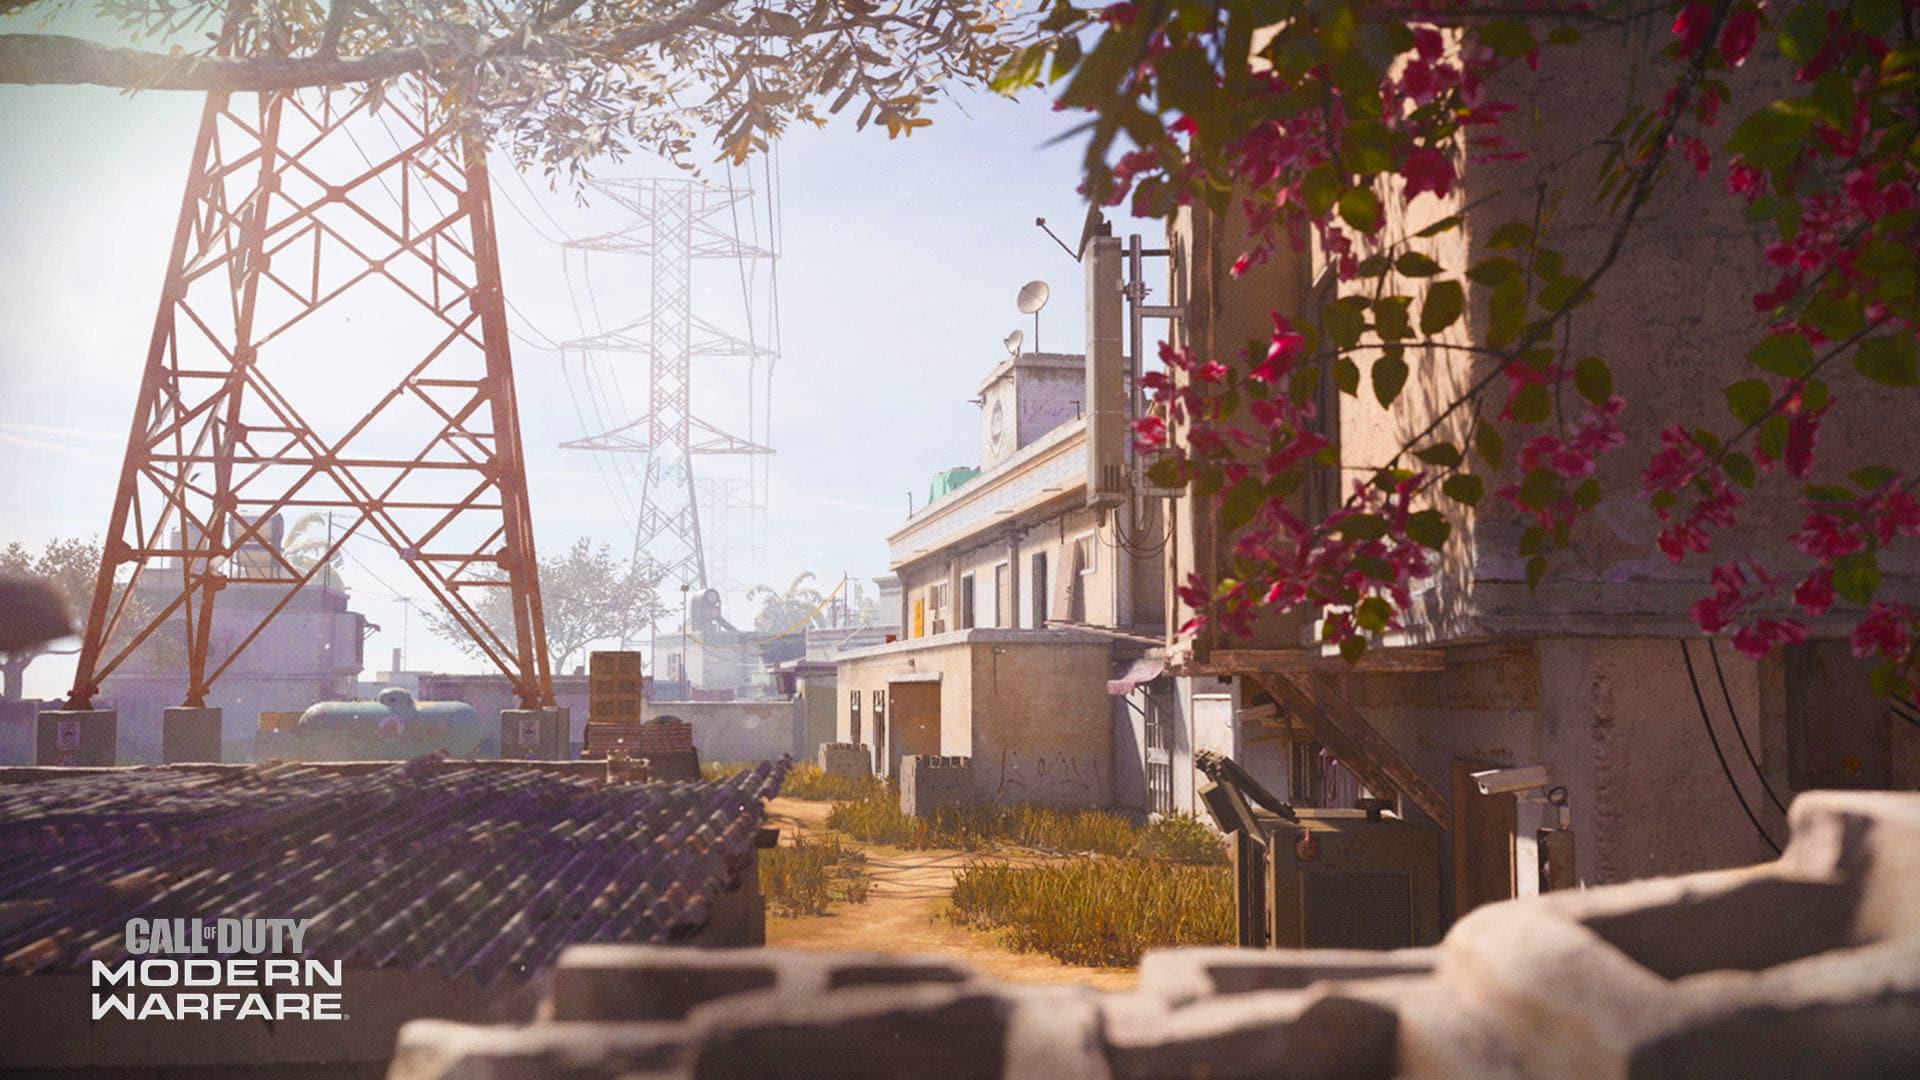 Новое обновление для Call of Duty Modern Warfare и Warzone от 26 марта 2020 1.16.2